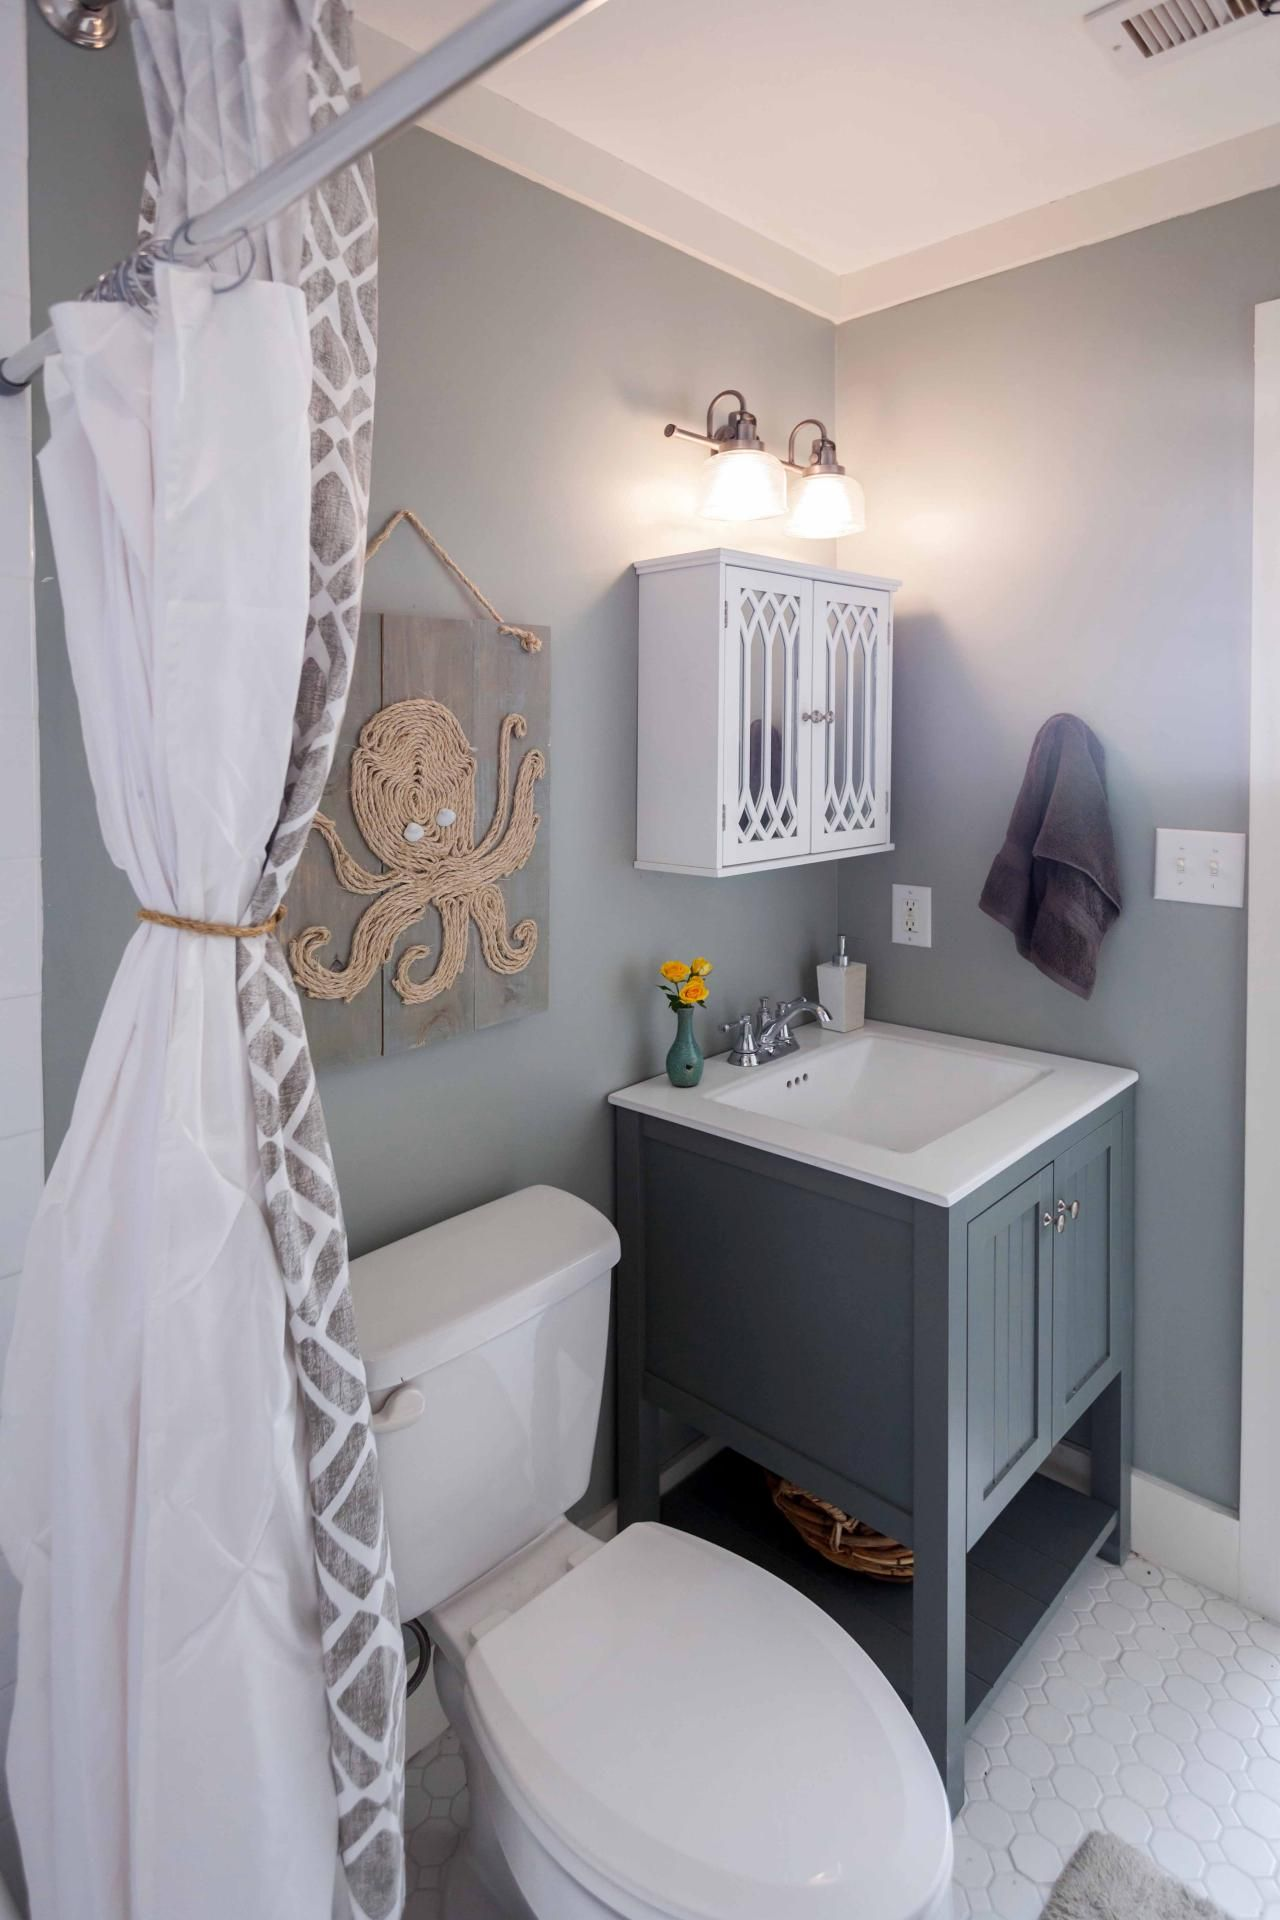 title | Rustic Beach Bathroom Decor